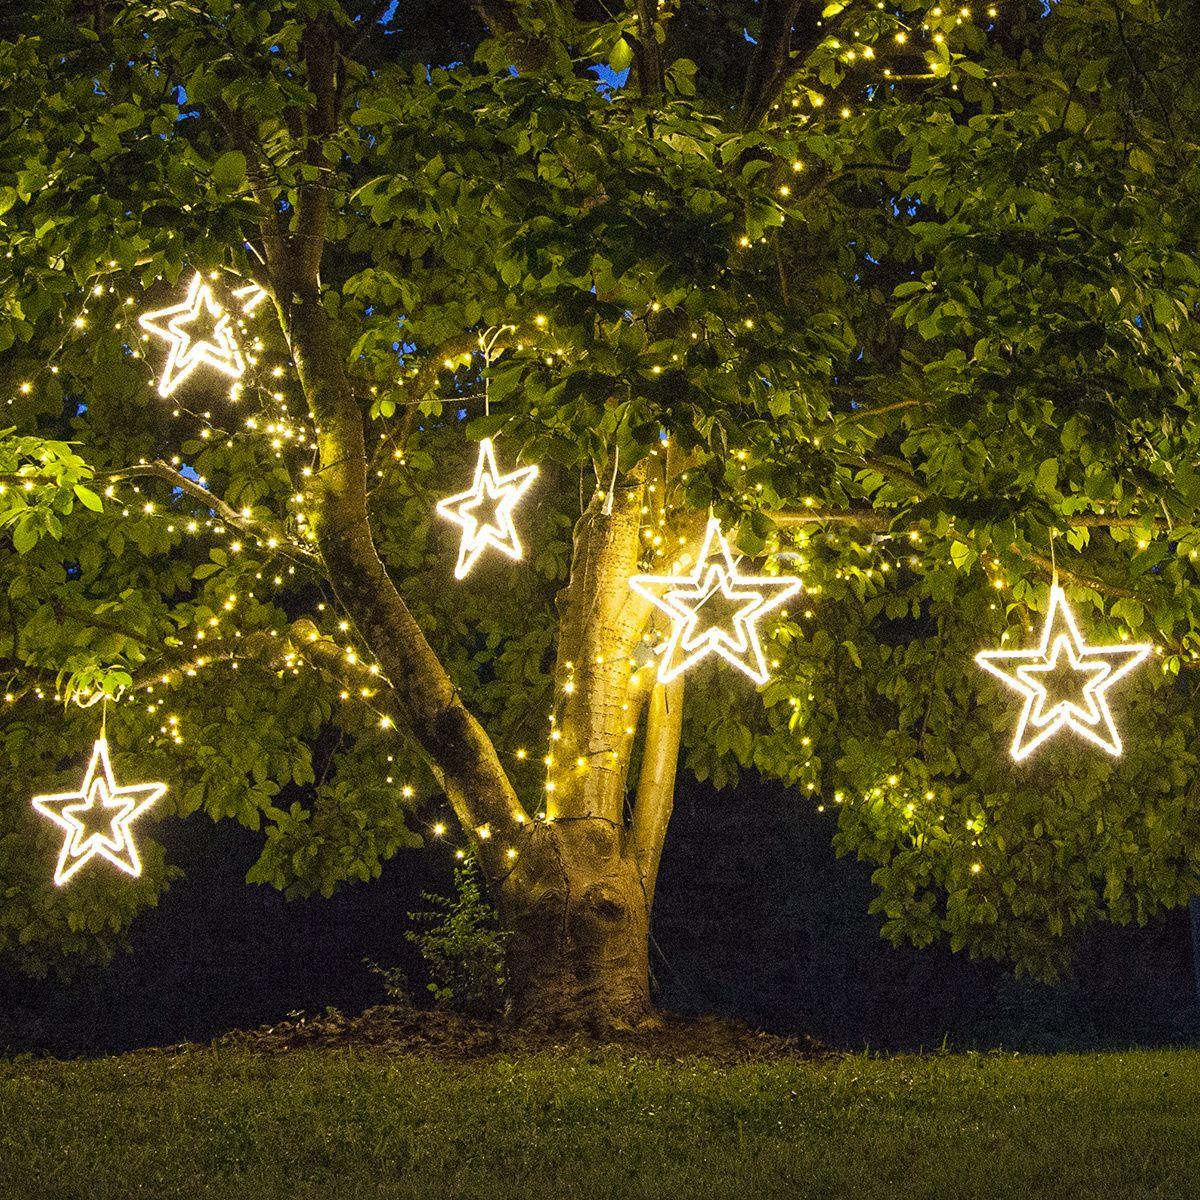 Wrapping Trees With Christmas Lights Christmas Lights Etc Hanging Christmas Lights Star Christmas Lights Outdoor Christmas